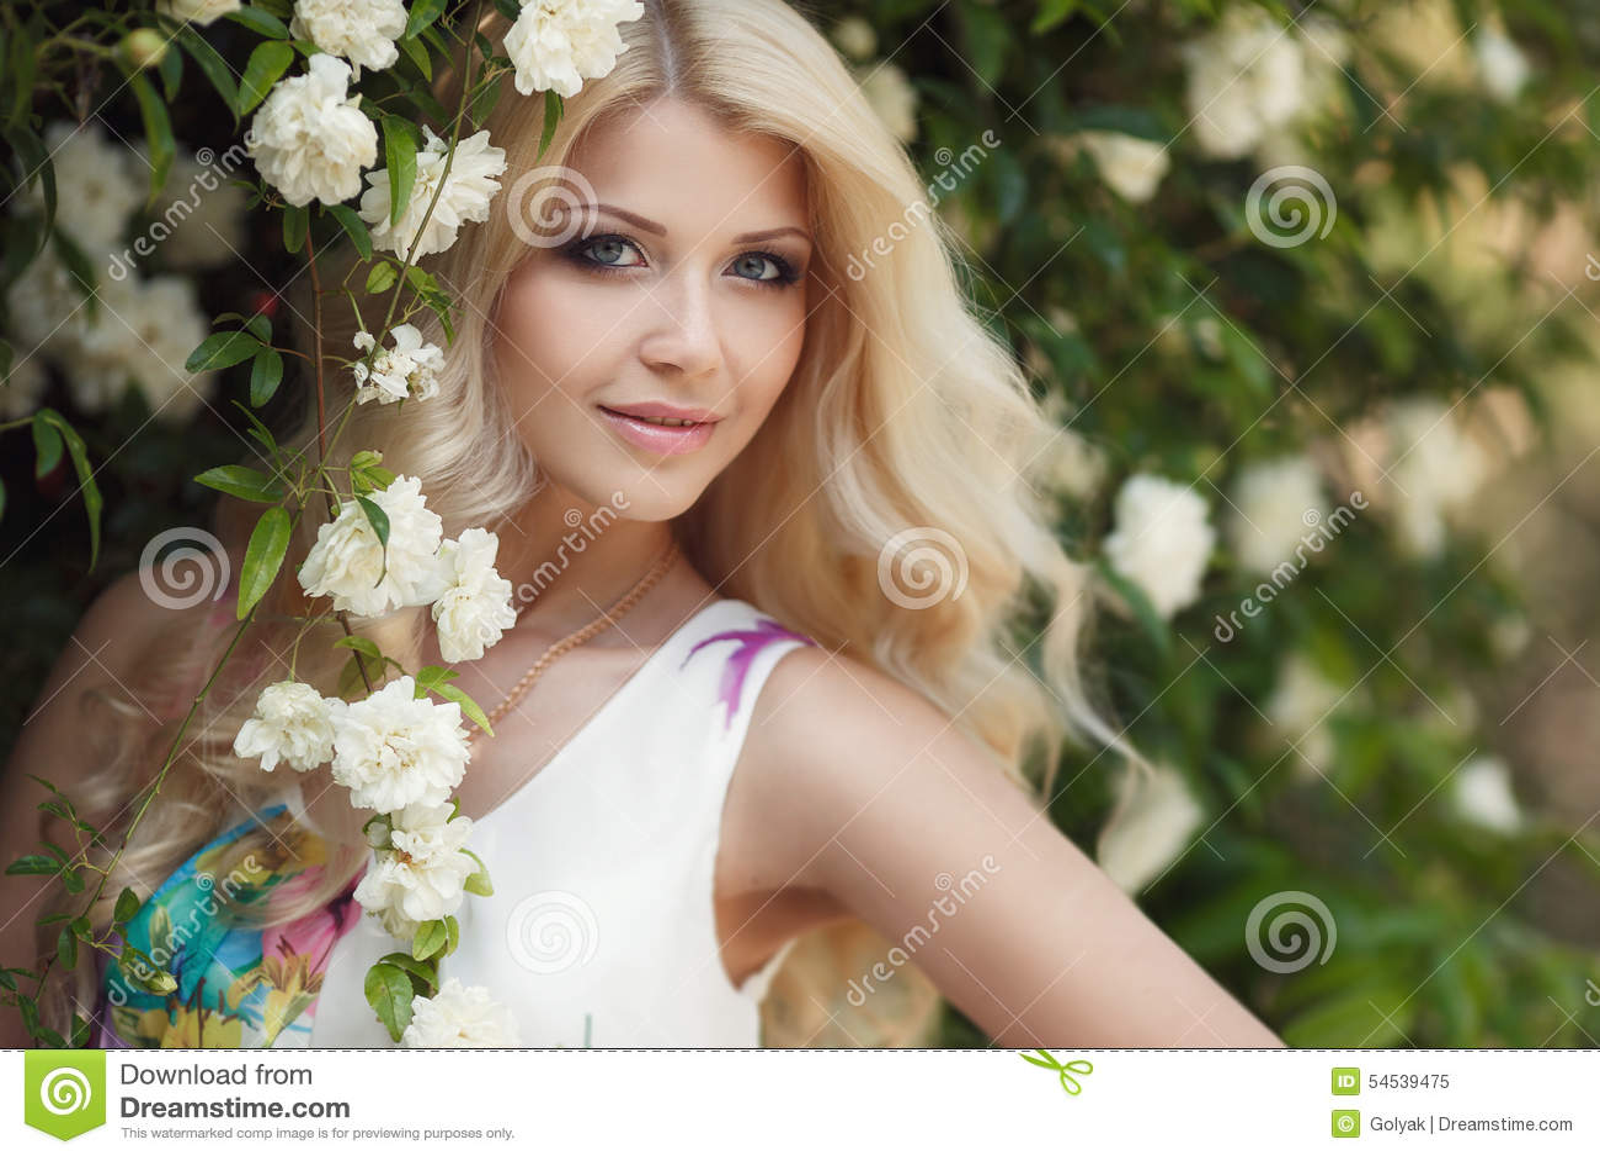 Women Blonde Blue Eyes Long Hair Wavy Hair Portrait: Beautiful Woman In Park Near The Bush Blooming Roses Stock